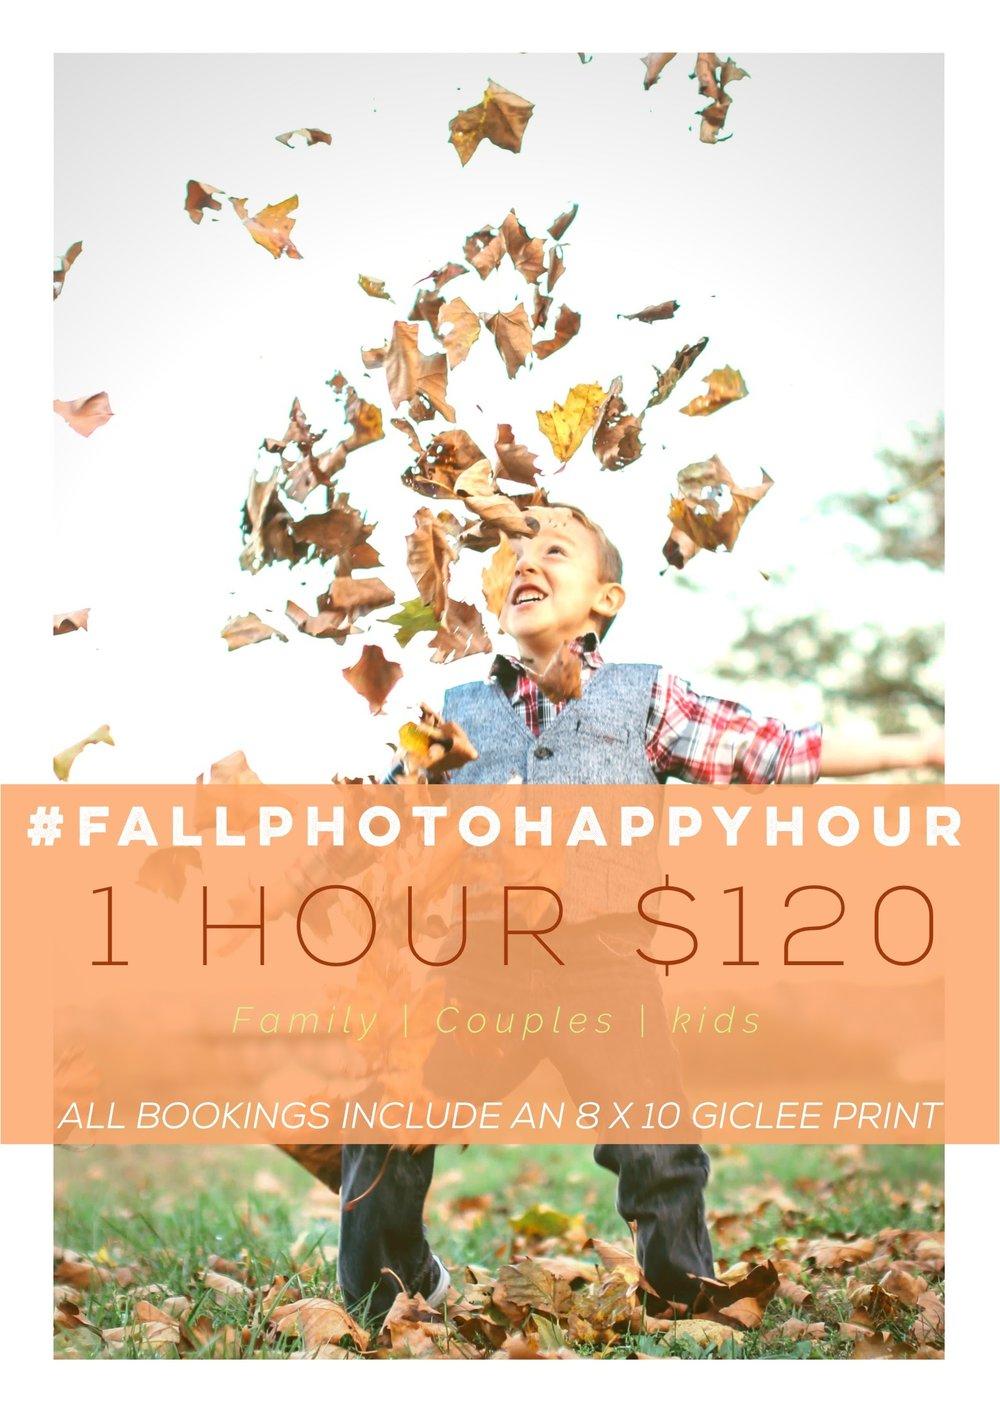 #FallPhotoHappyHour